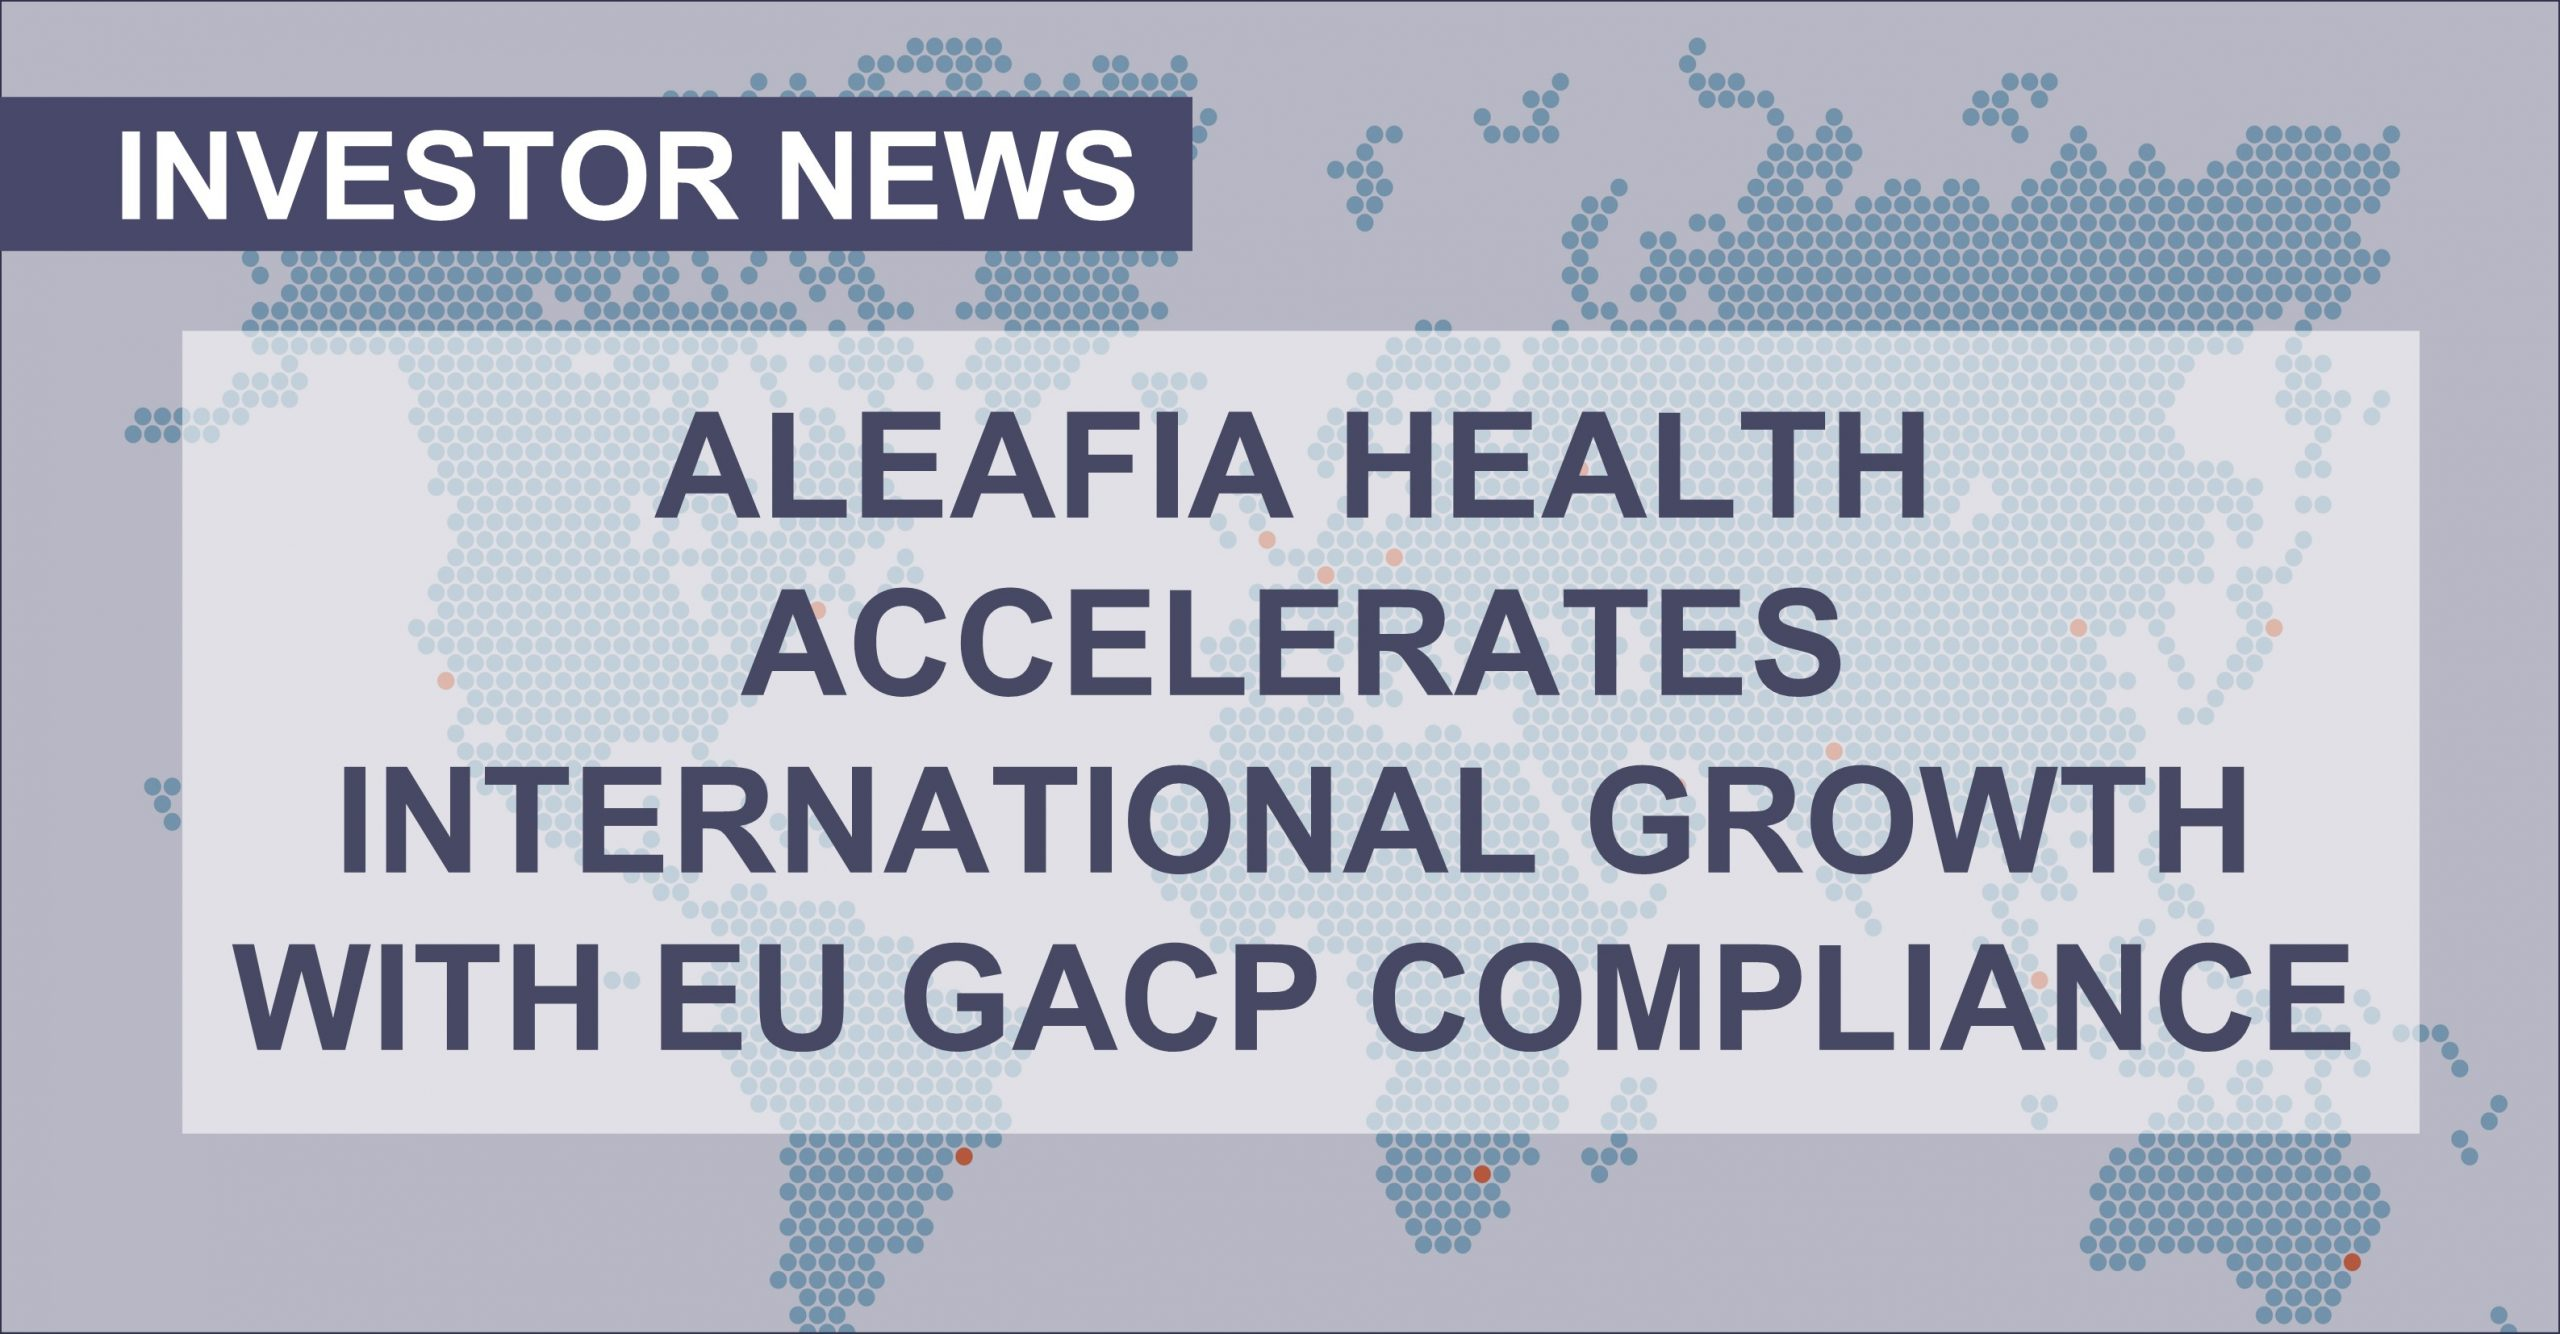 Aleafia Health Niagara Greenhouse Deemed EU GACP Compliant, Accelerating International Growth